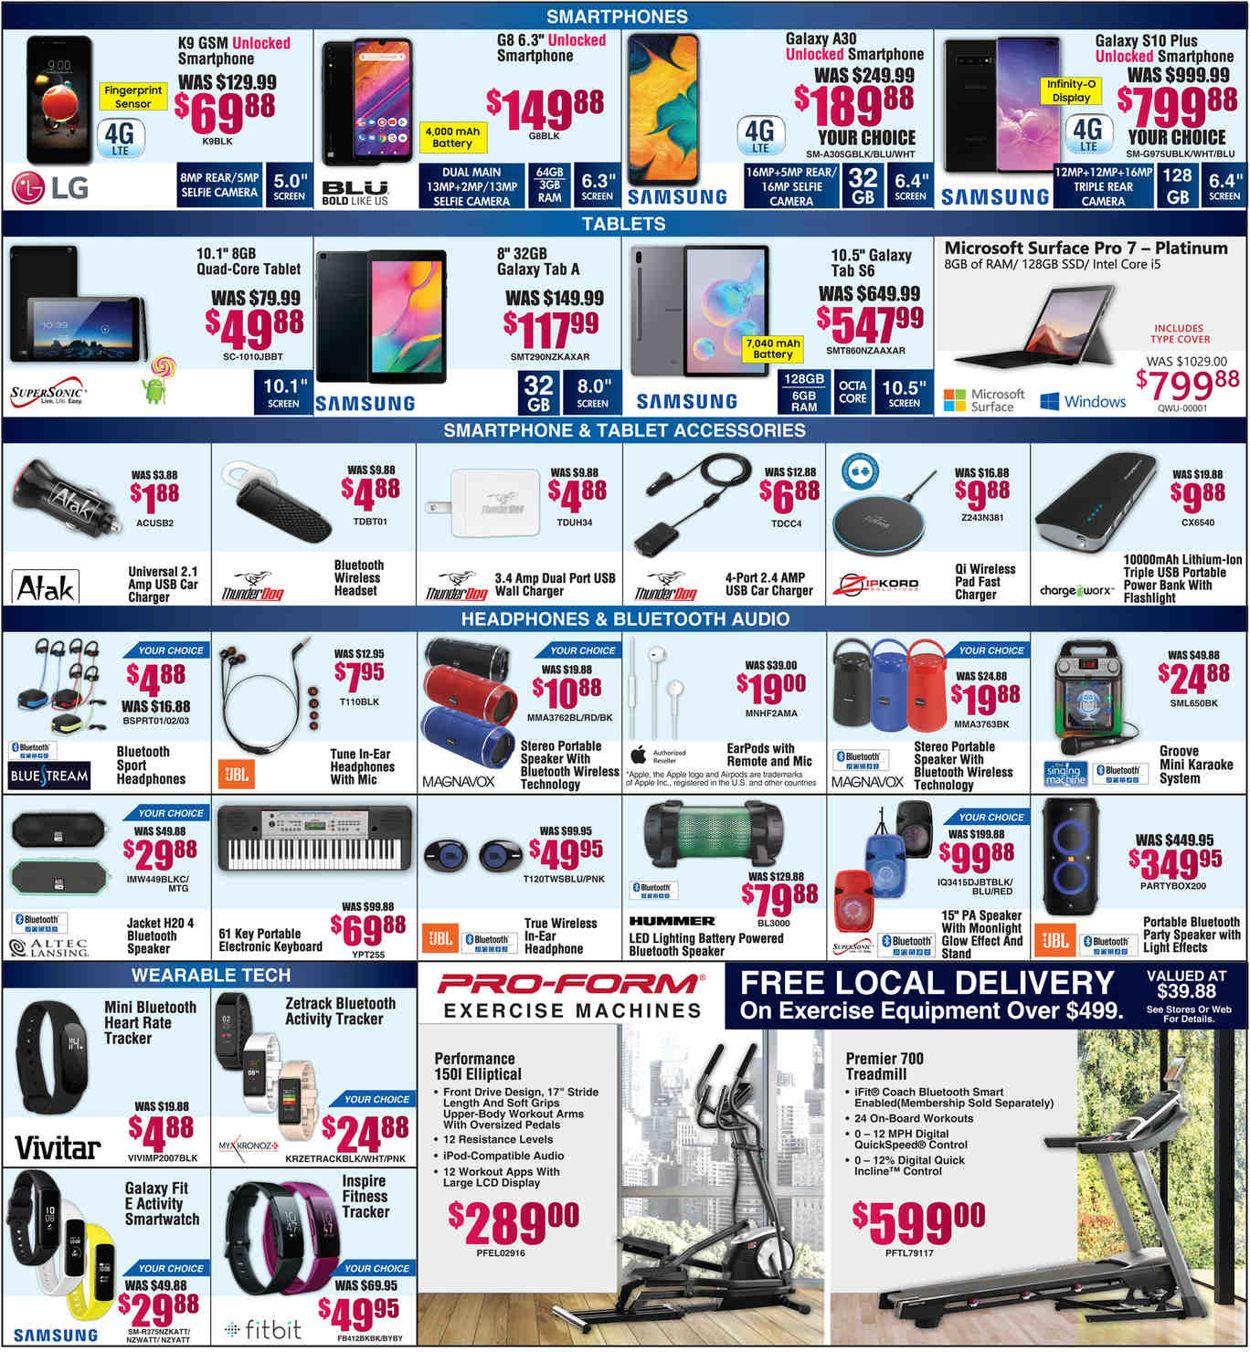 Catalogue Brandsmart USA - Black Friday Ad 2019 from 11/25/2019